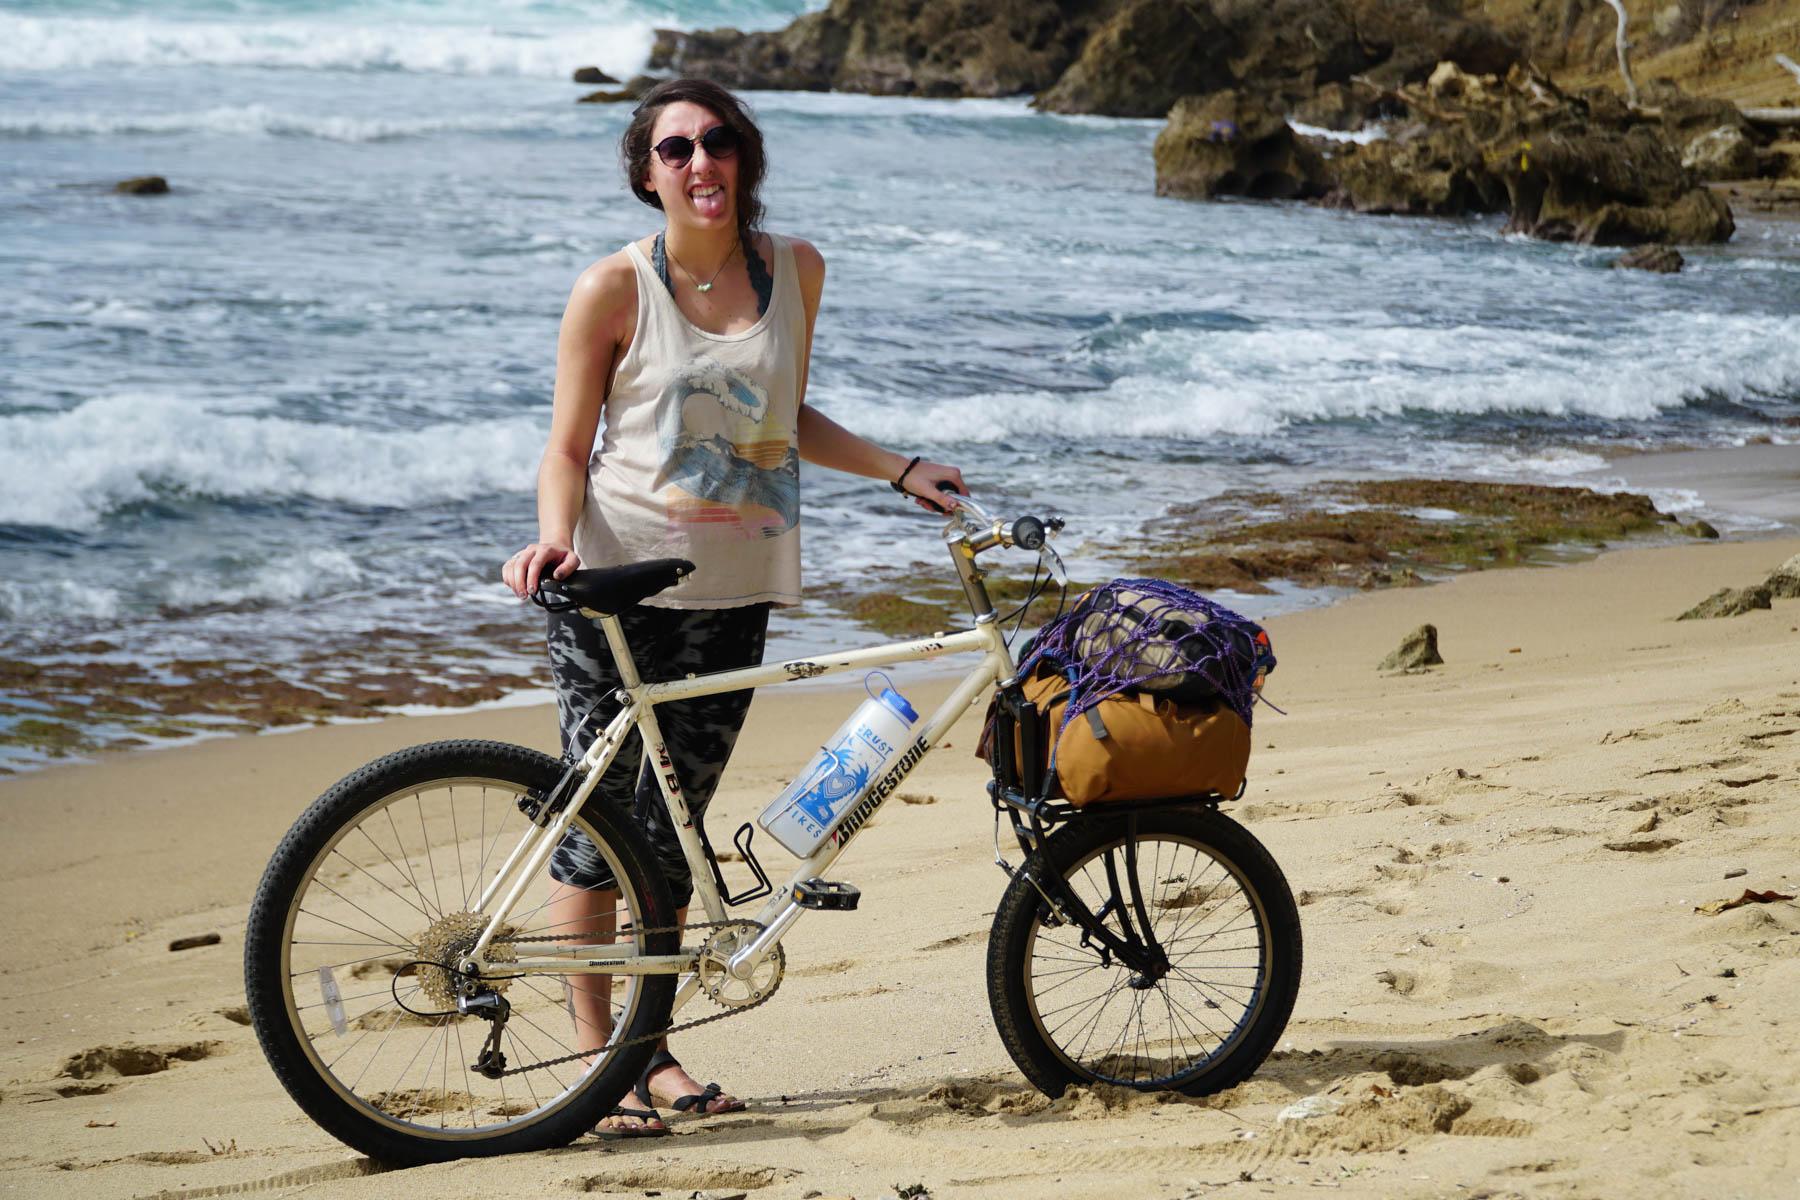 bikepacking-puerto-rico_03.jpg